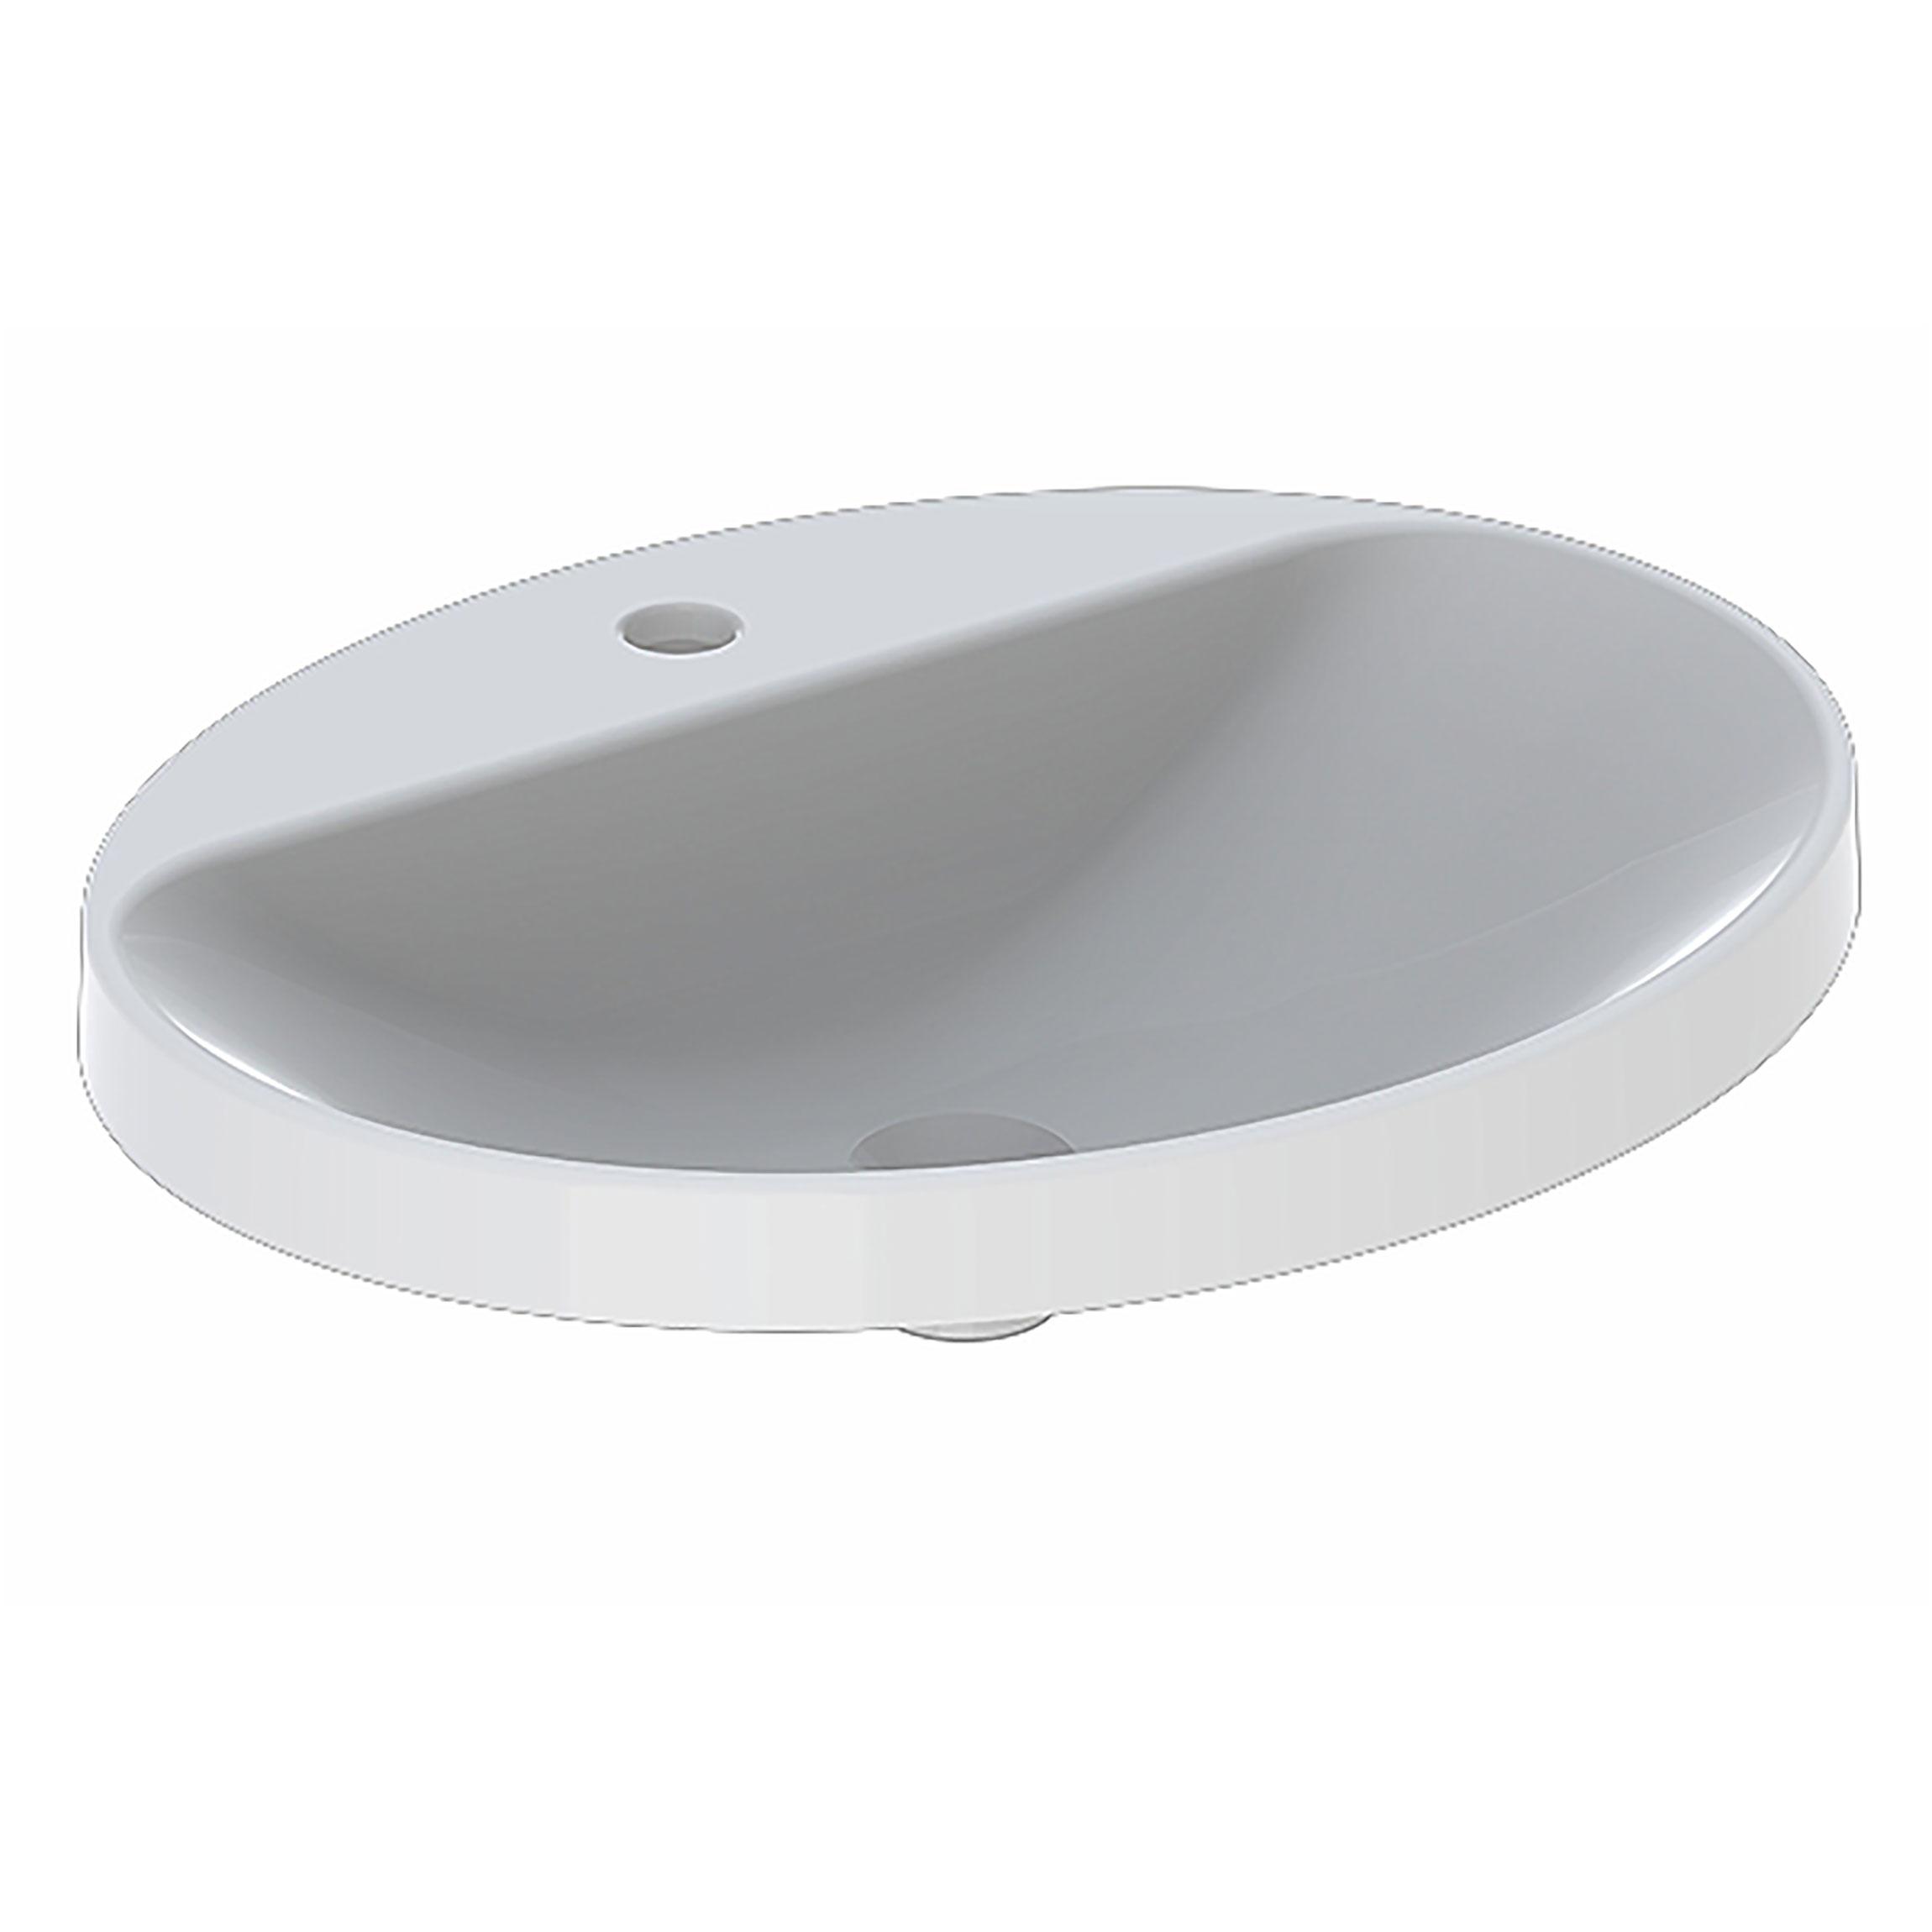 Tvättställ Ifö Variform 600 mm Infälld Ovalt Kanthylla